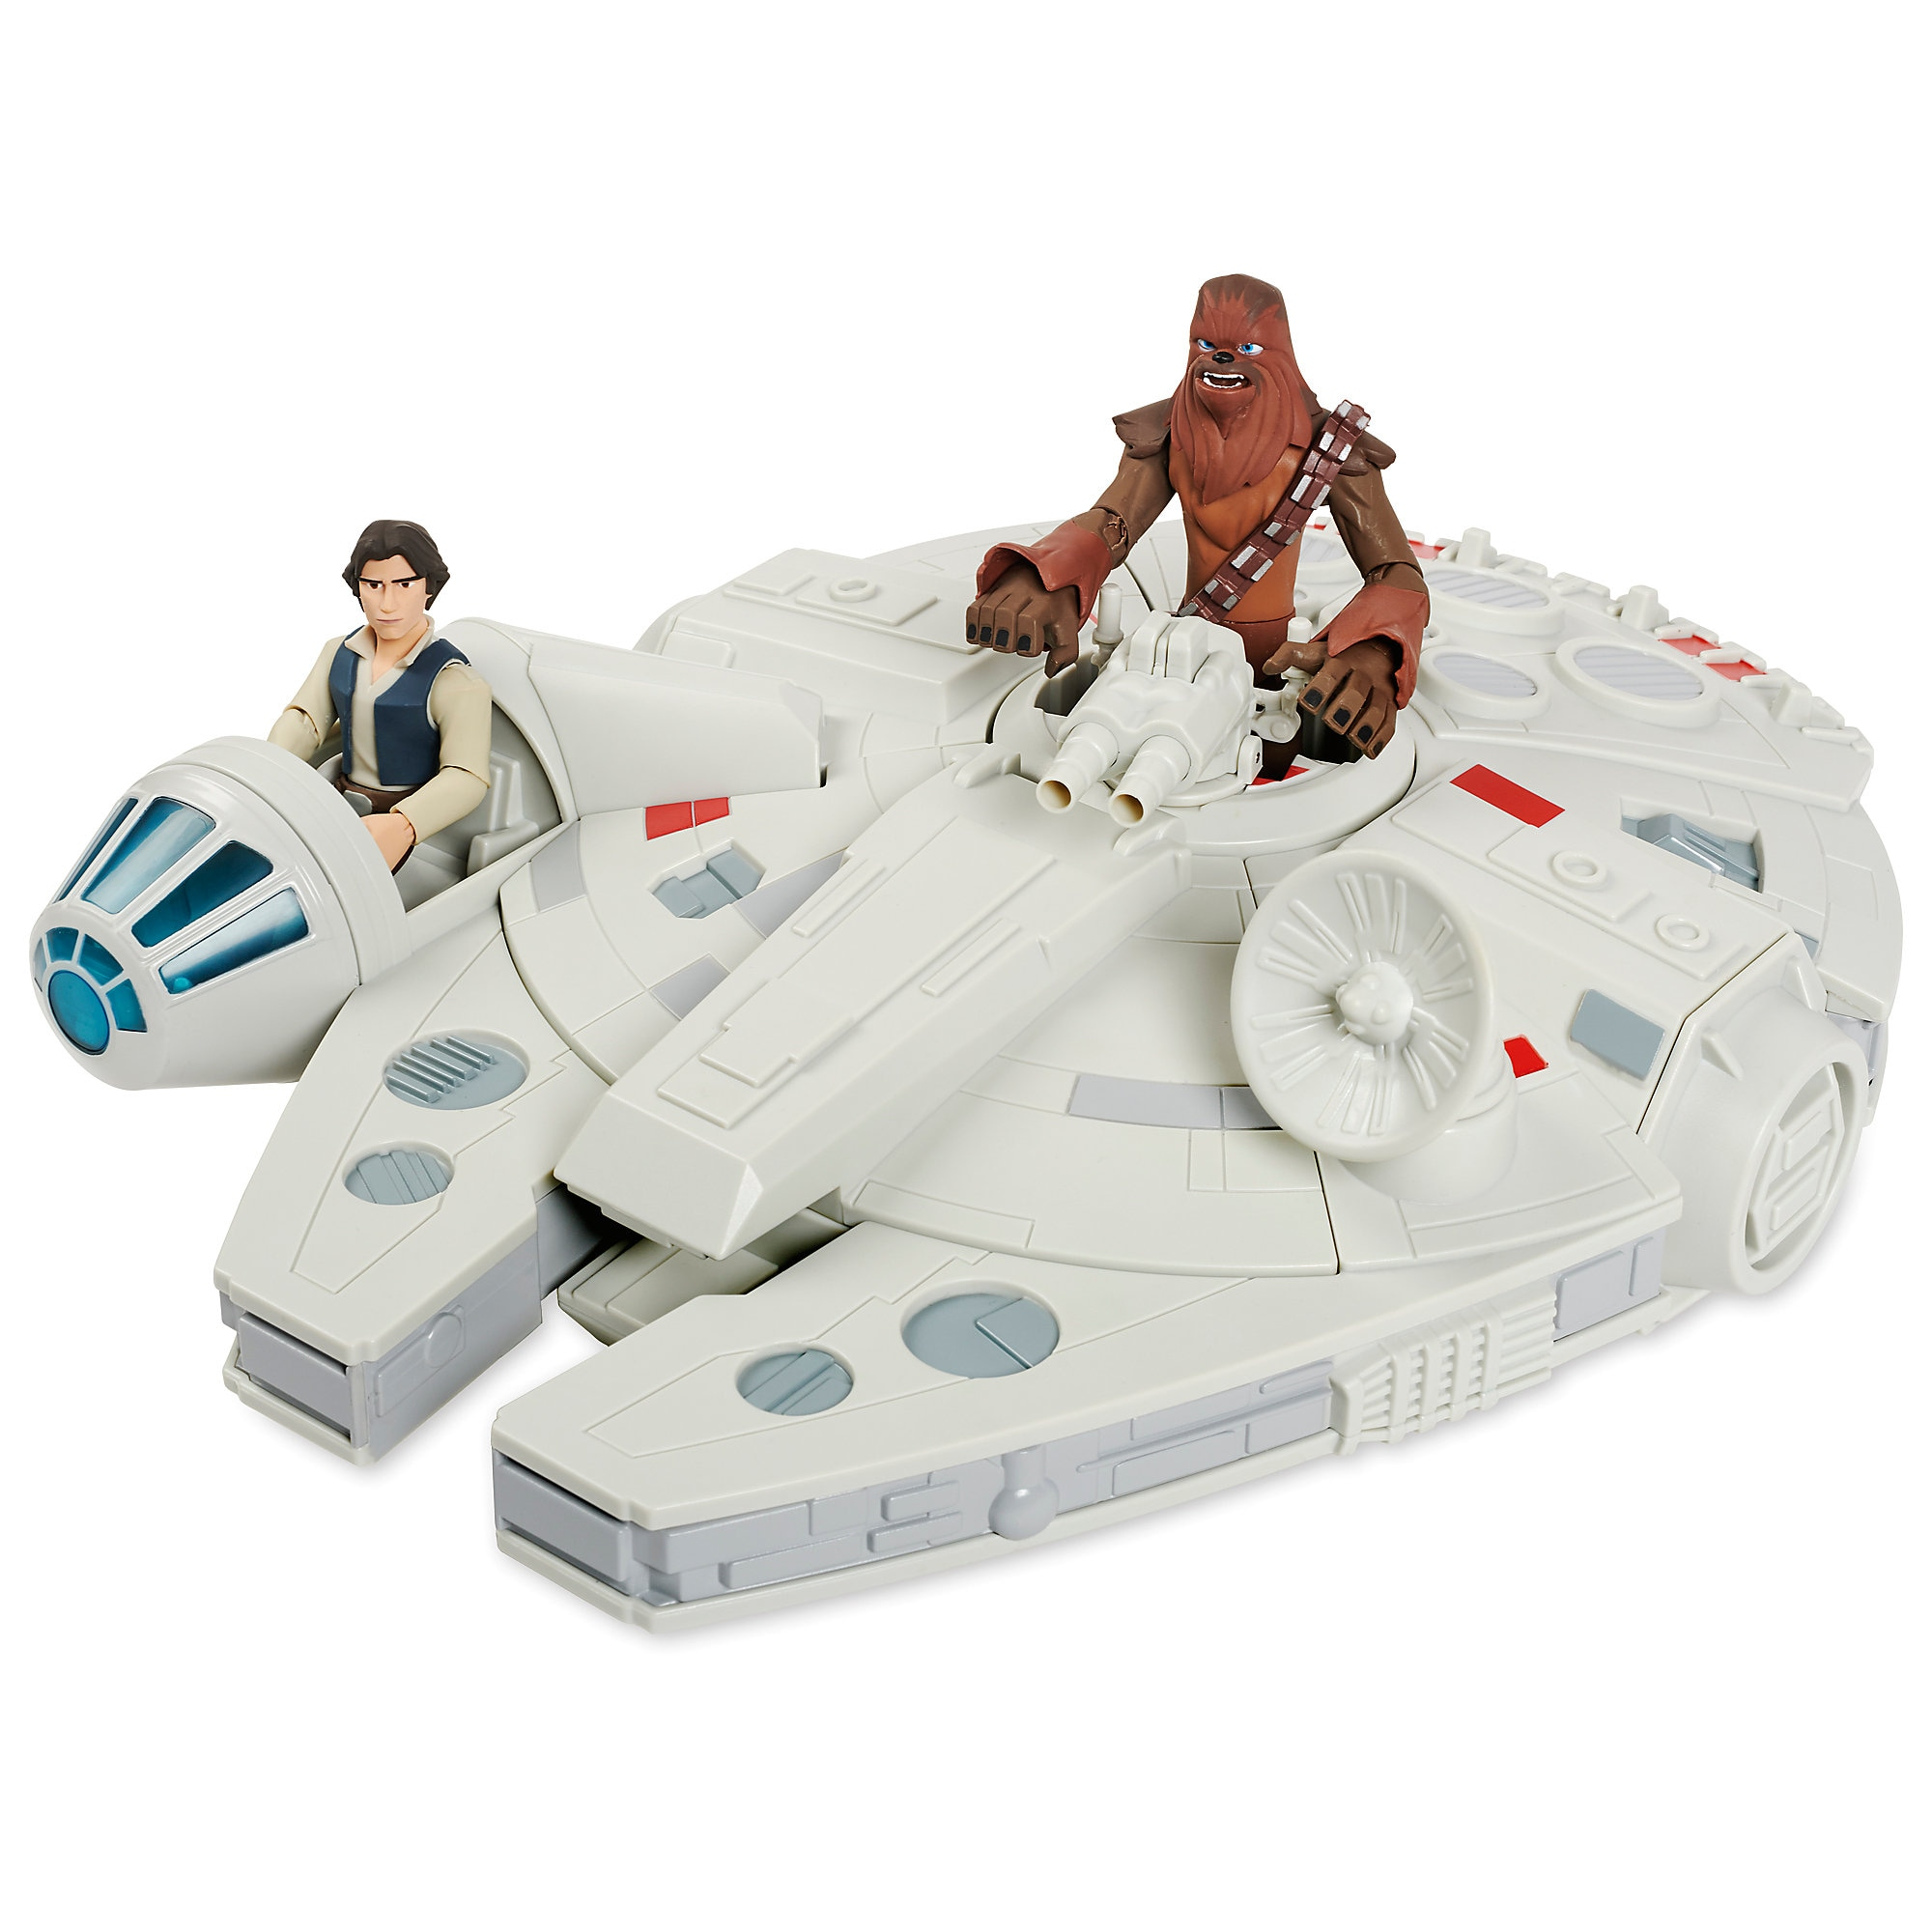 Millennium Falcon Star Wars Play Set - Star Wars Toybox